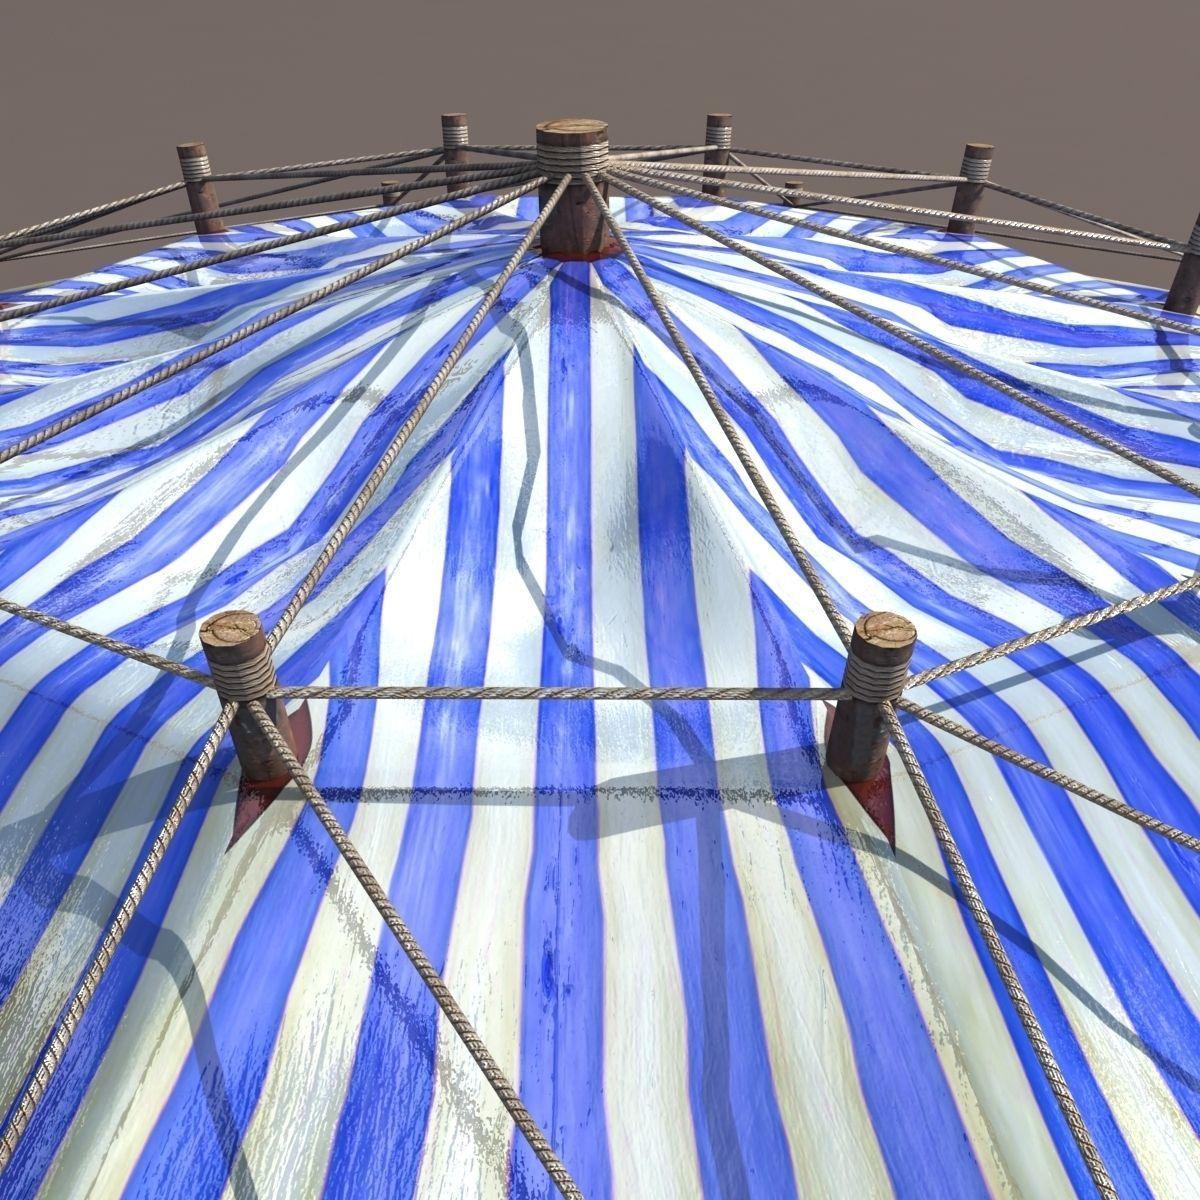 ... blue circus tent 3d model low-poly max obj 3ds fbx 4 ... & Blue Circus Tent 3D asset | CGTrader